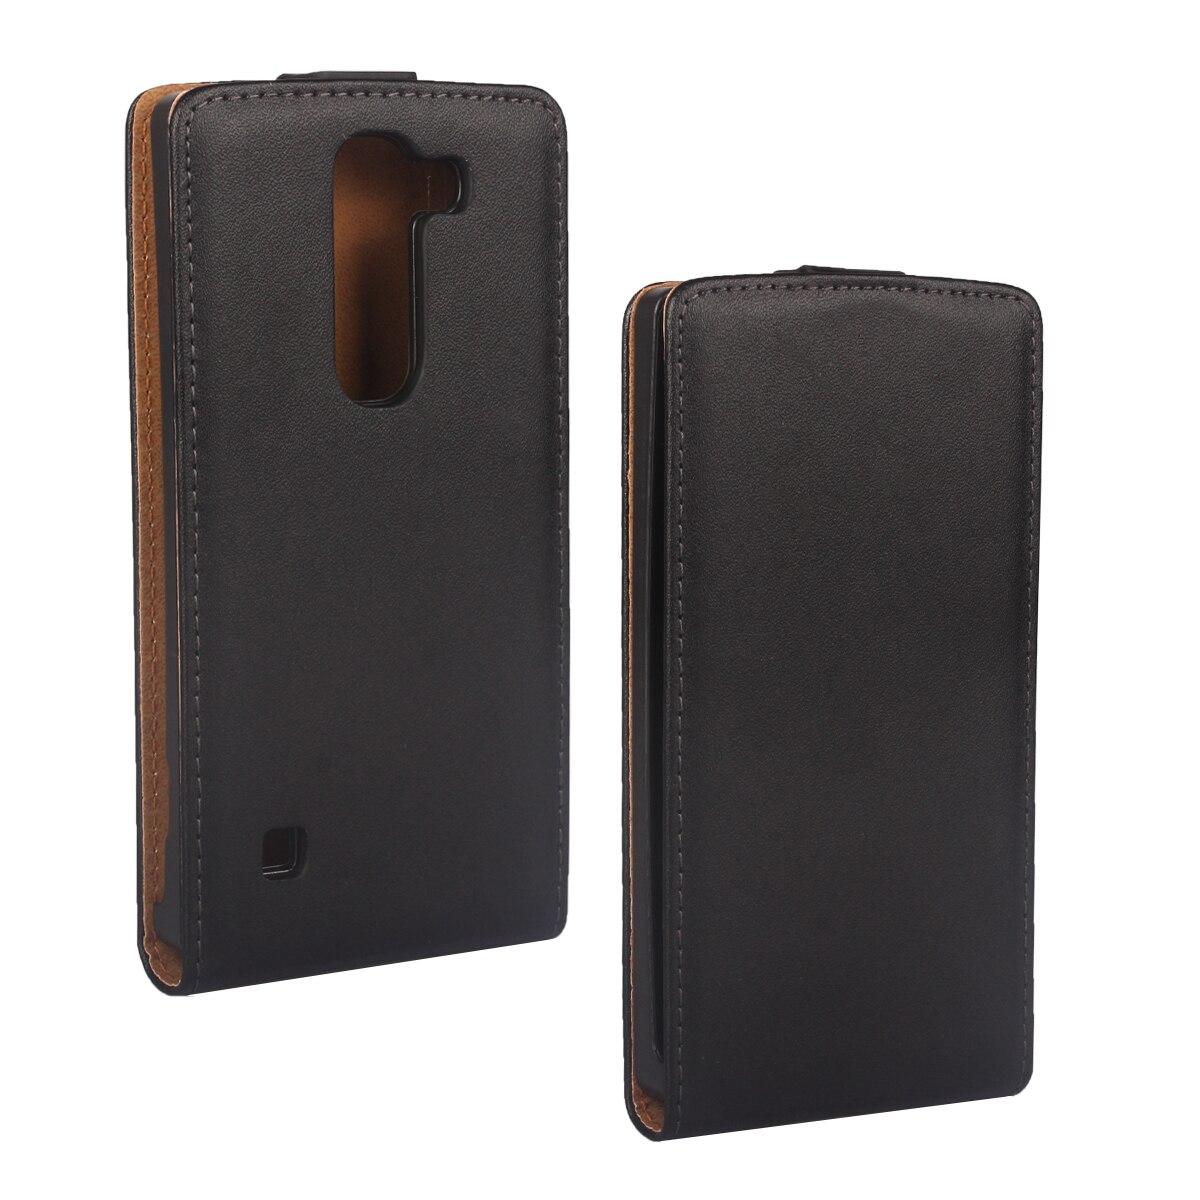 Vertical Flip Case For LG Spirit Leon 4G LTE Magna G4c Flex 2 G Pro Lite Dual D686 Cover Leather Coque For LG Spirit Phone BagVertical Flip Case For LG Spirit Leon 4G LTE Magna G4c Flex 2 G Pro Lite Dual D686 Cover Leather Coque For LG Spirit Phone Bag